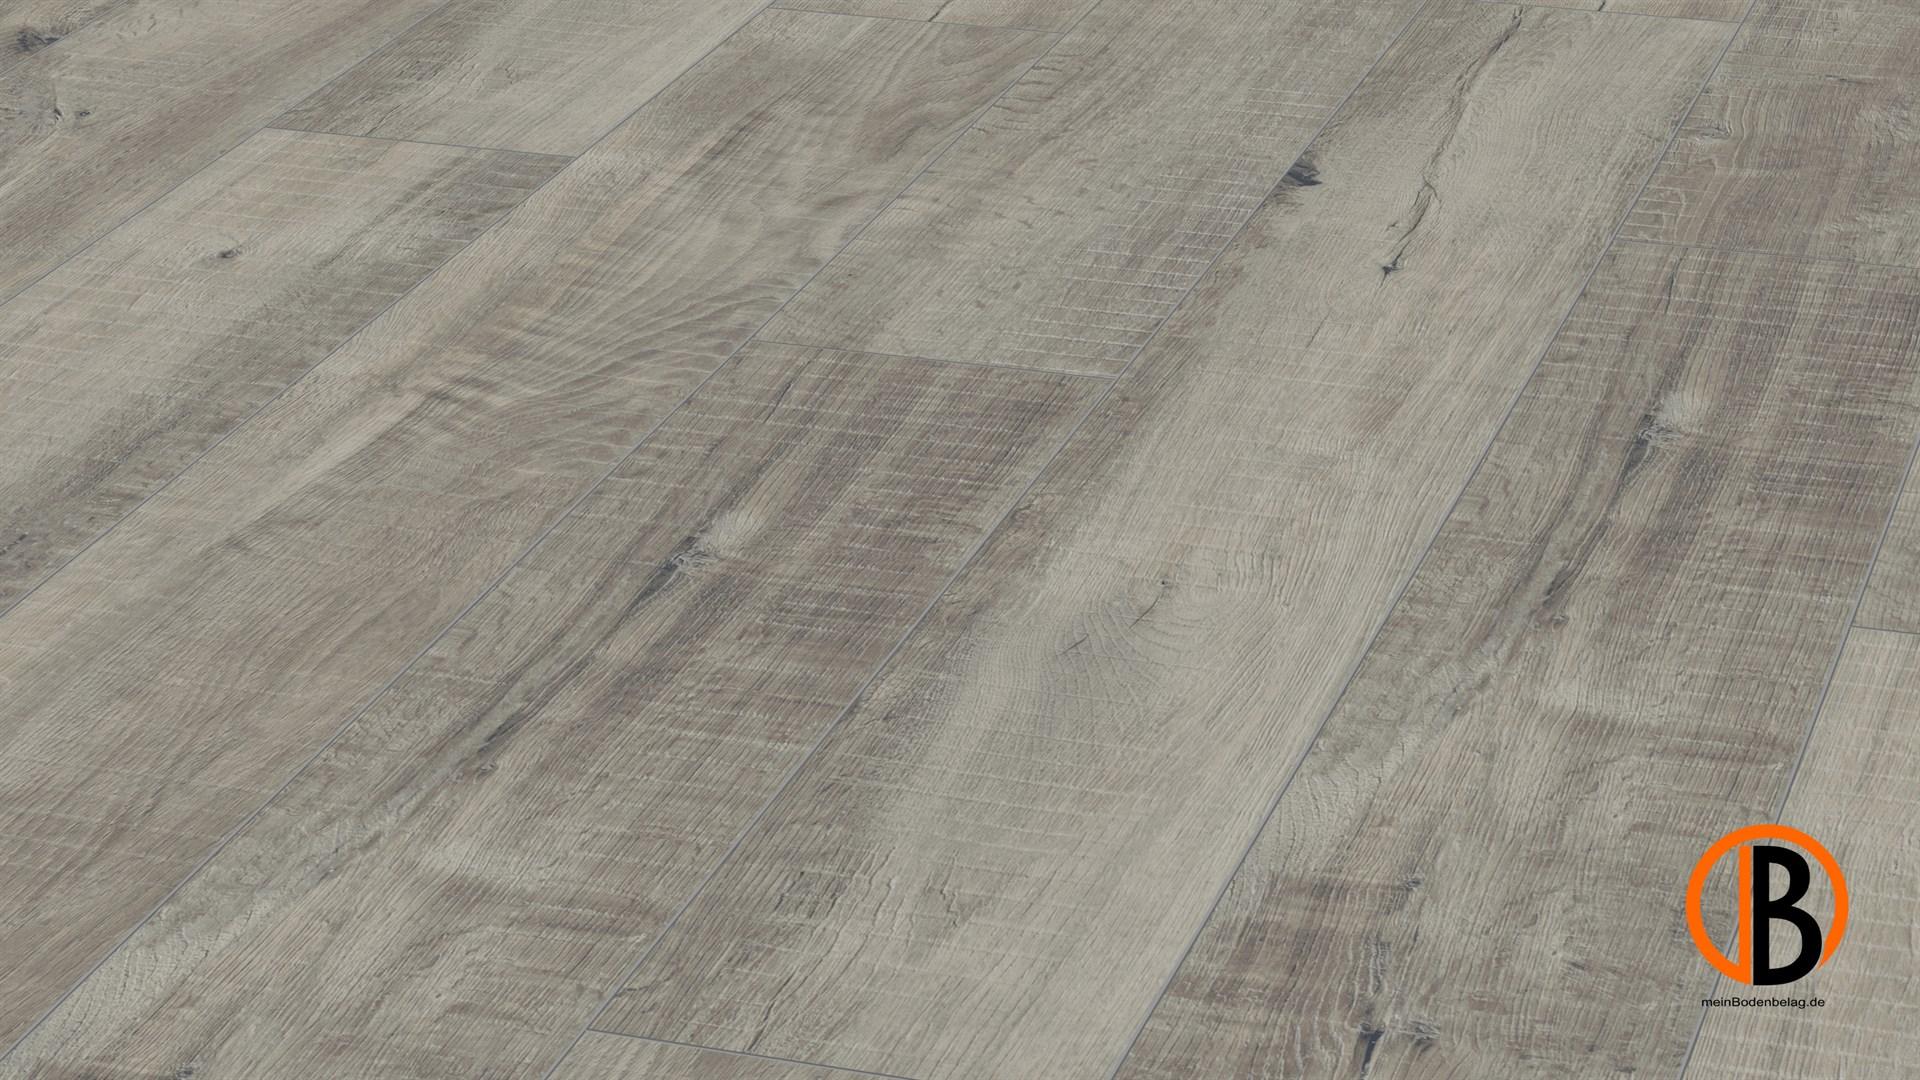 kronotex laminat exquisit 4786 gala eiche grau. Black Bedroom Furniture Sets. Home Design Ideas